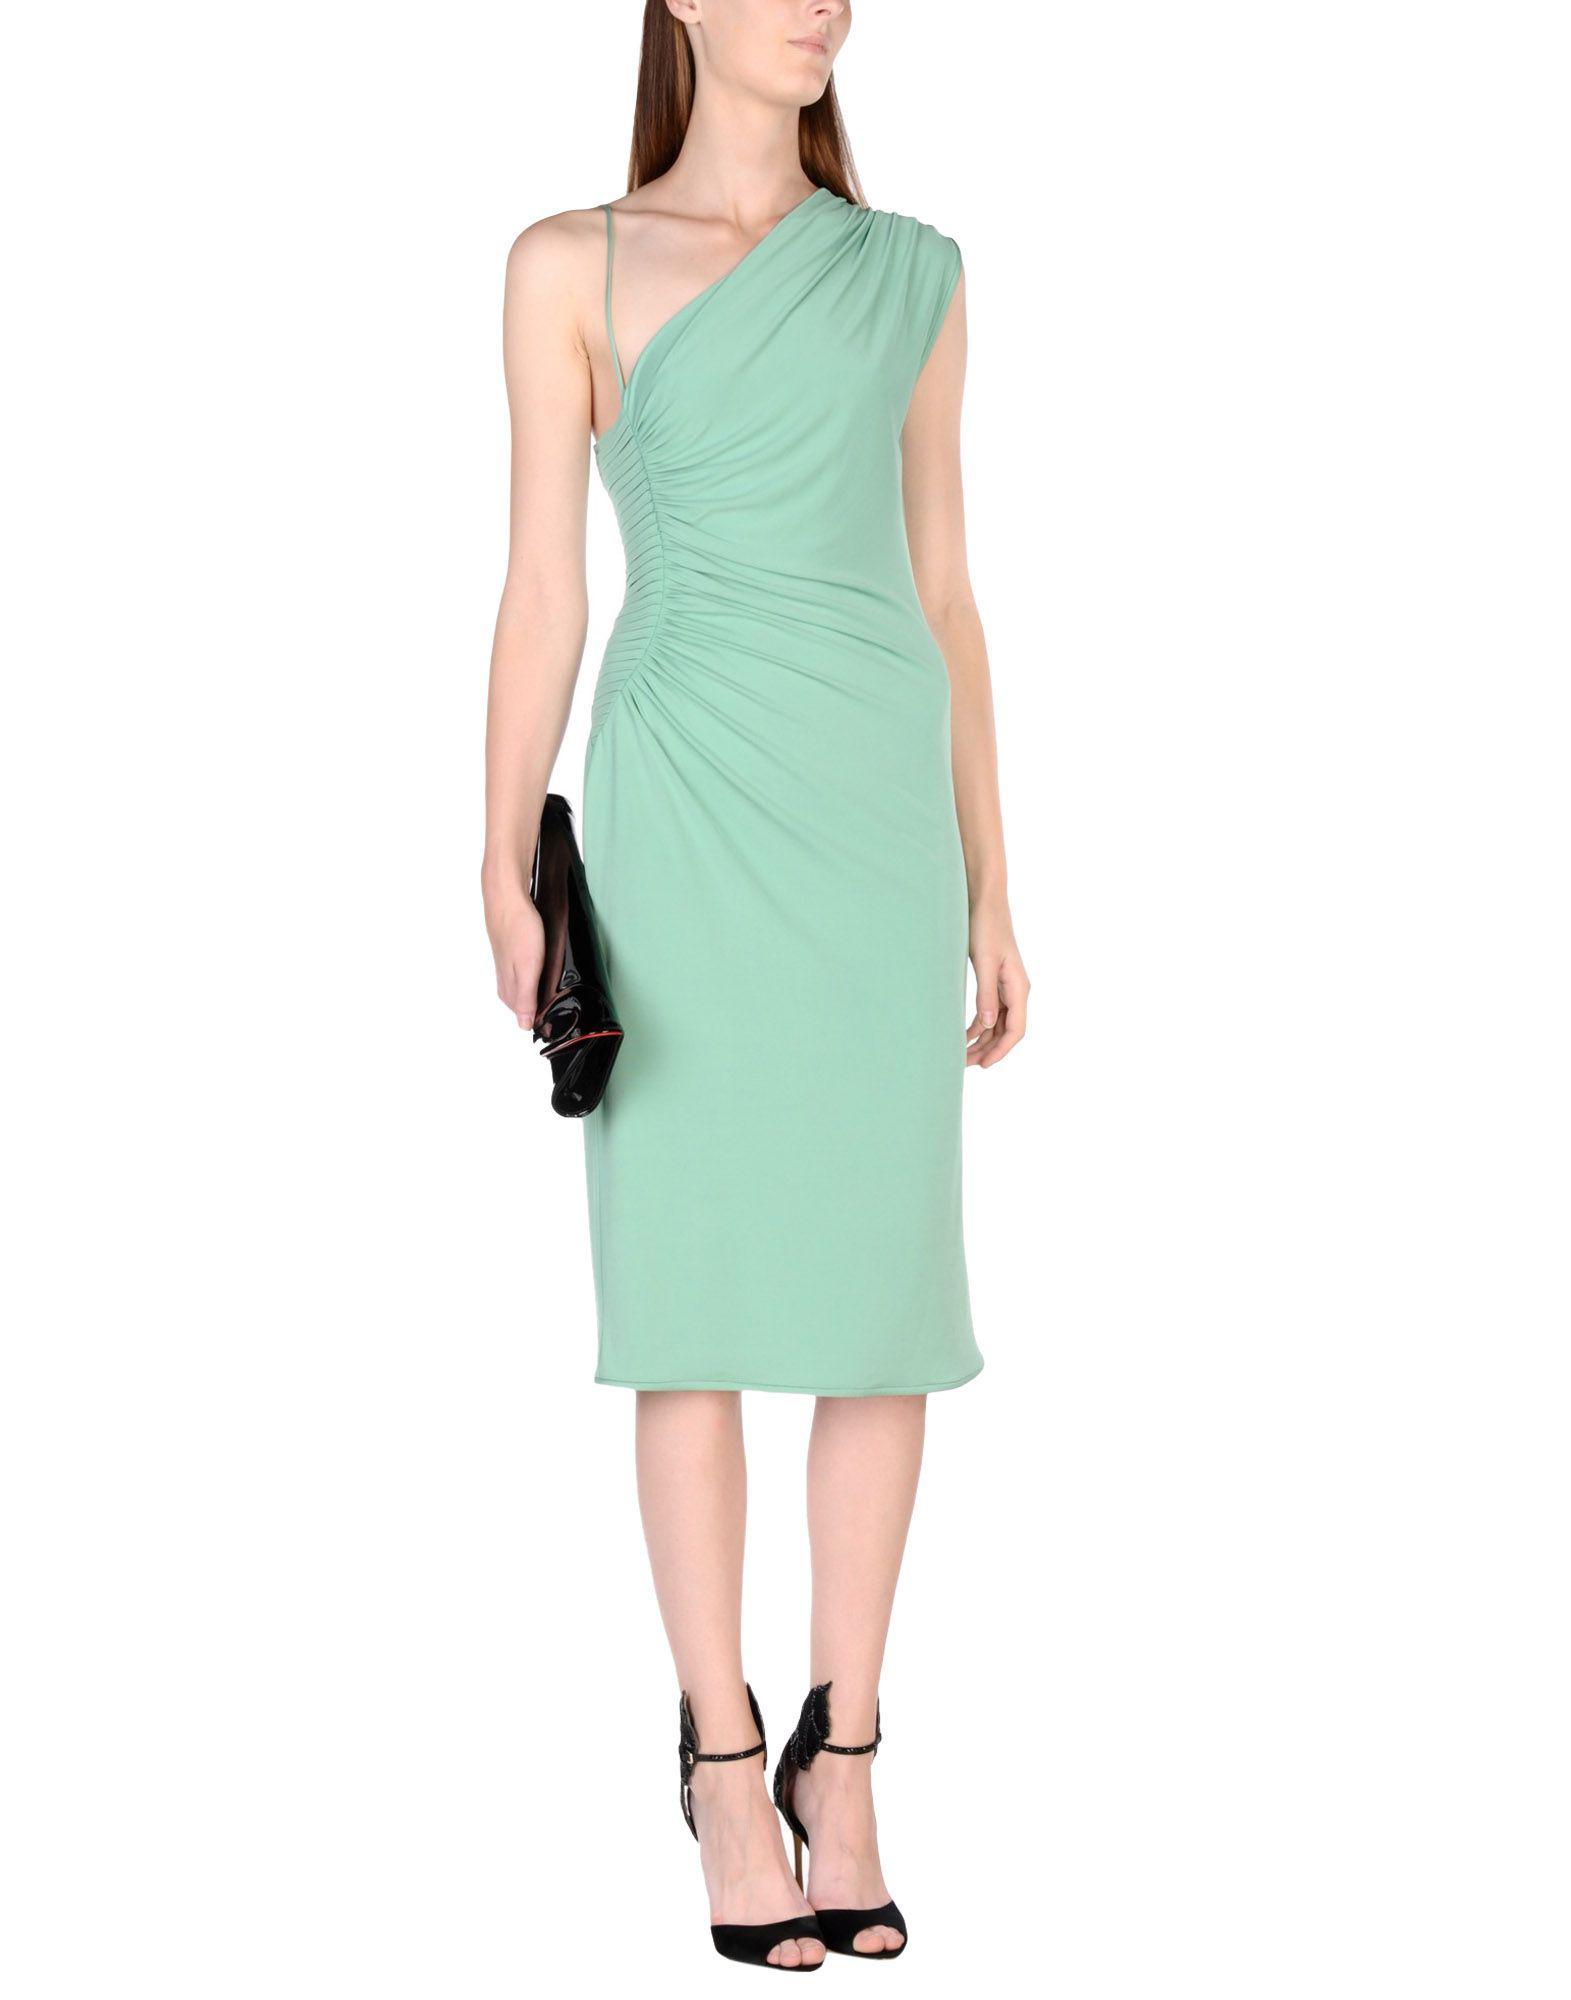 Fine Armani Cocktail Dresses Illustration - All Wedding Dresses ...